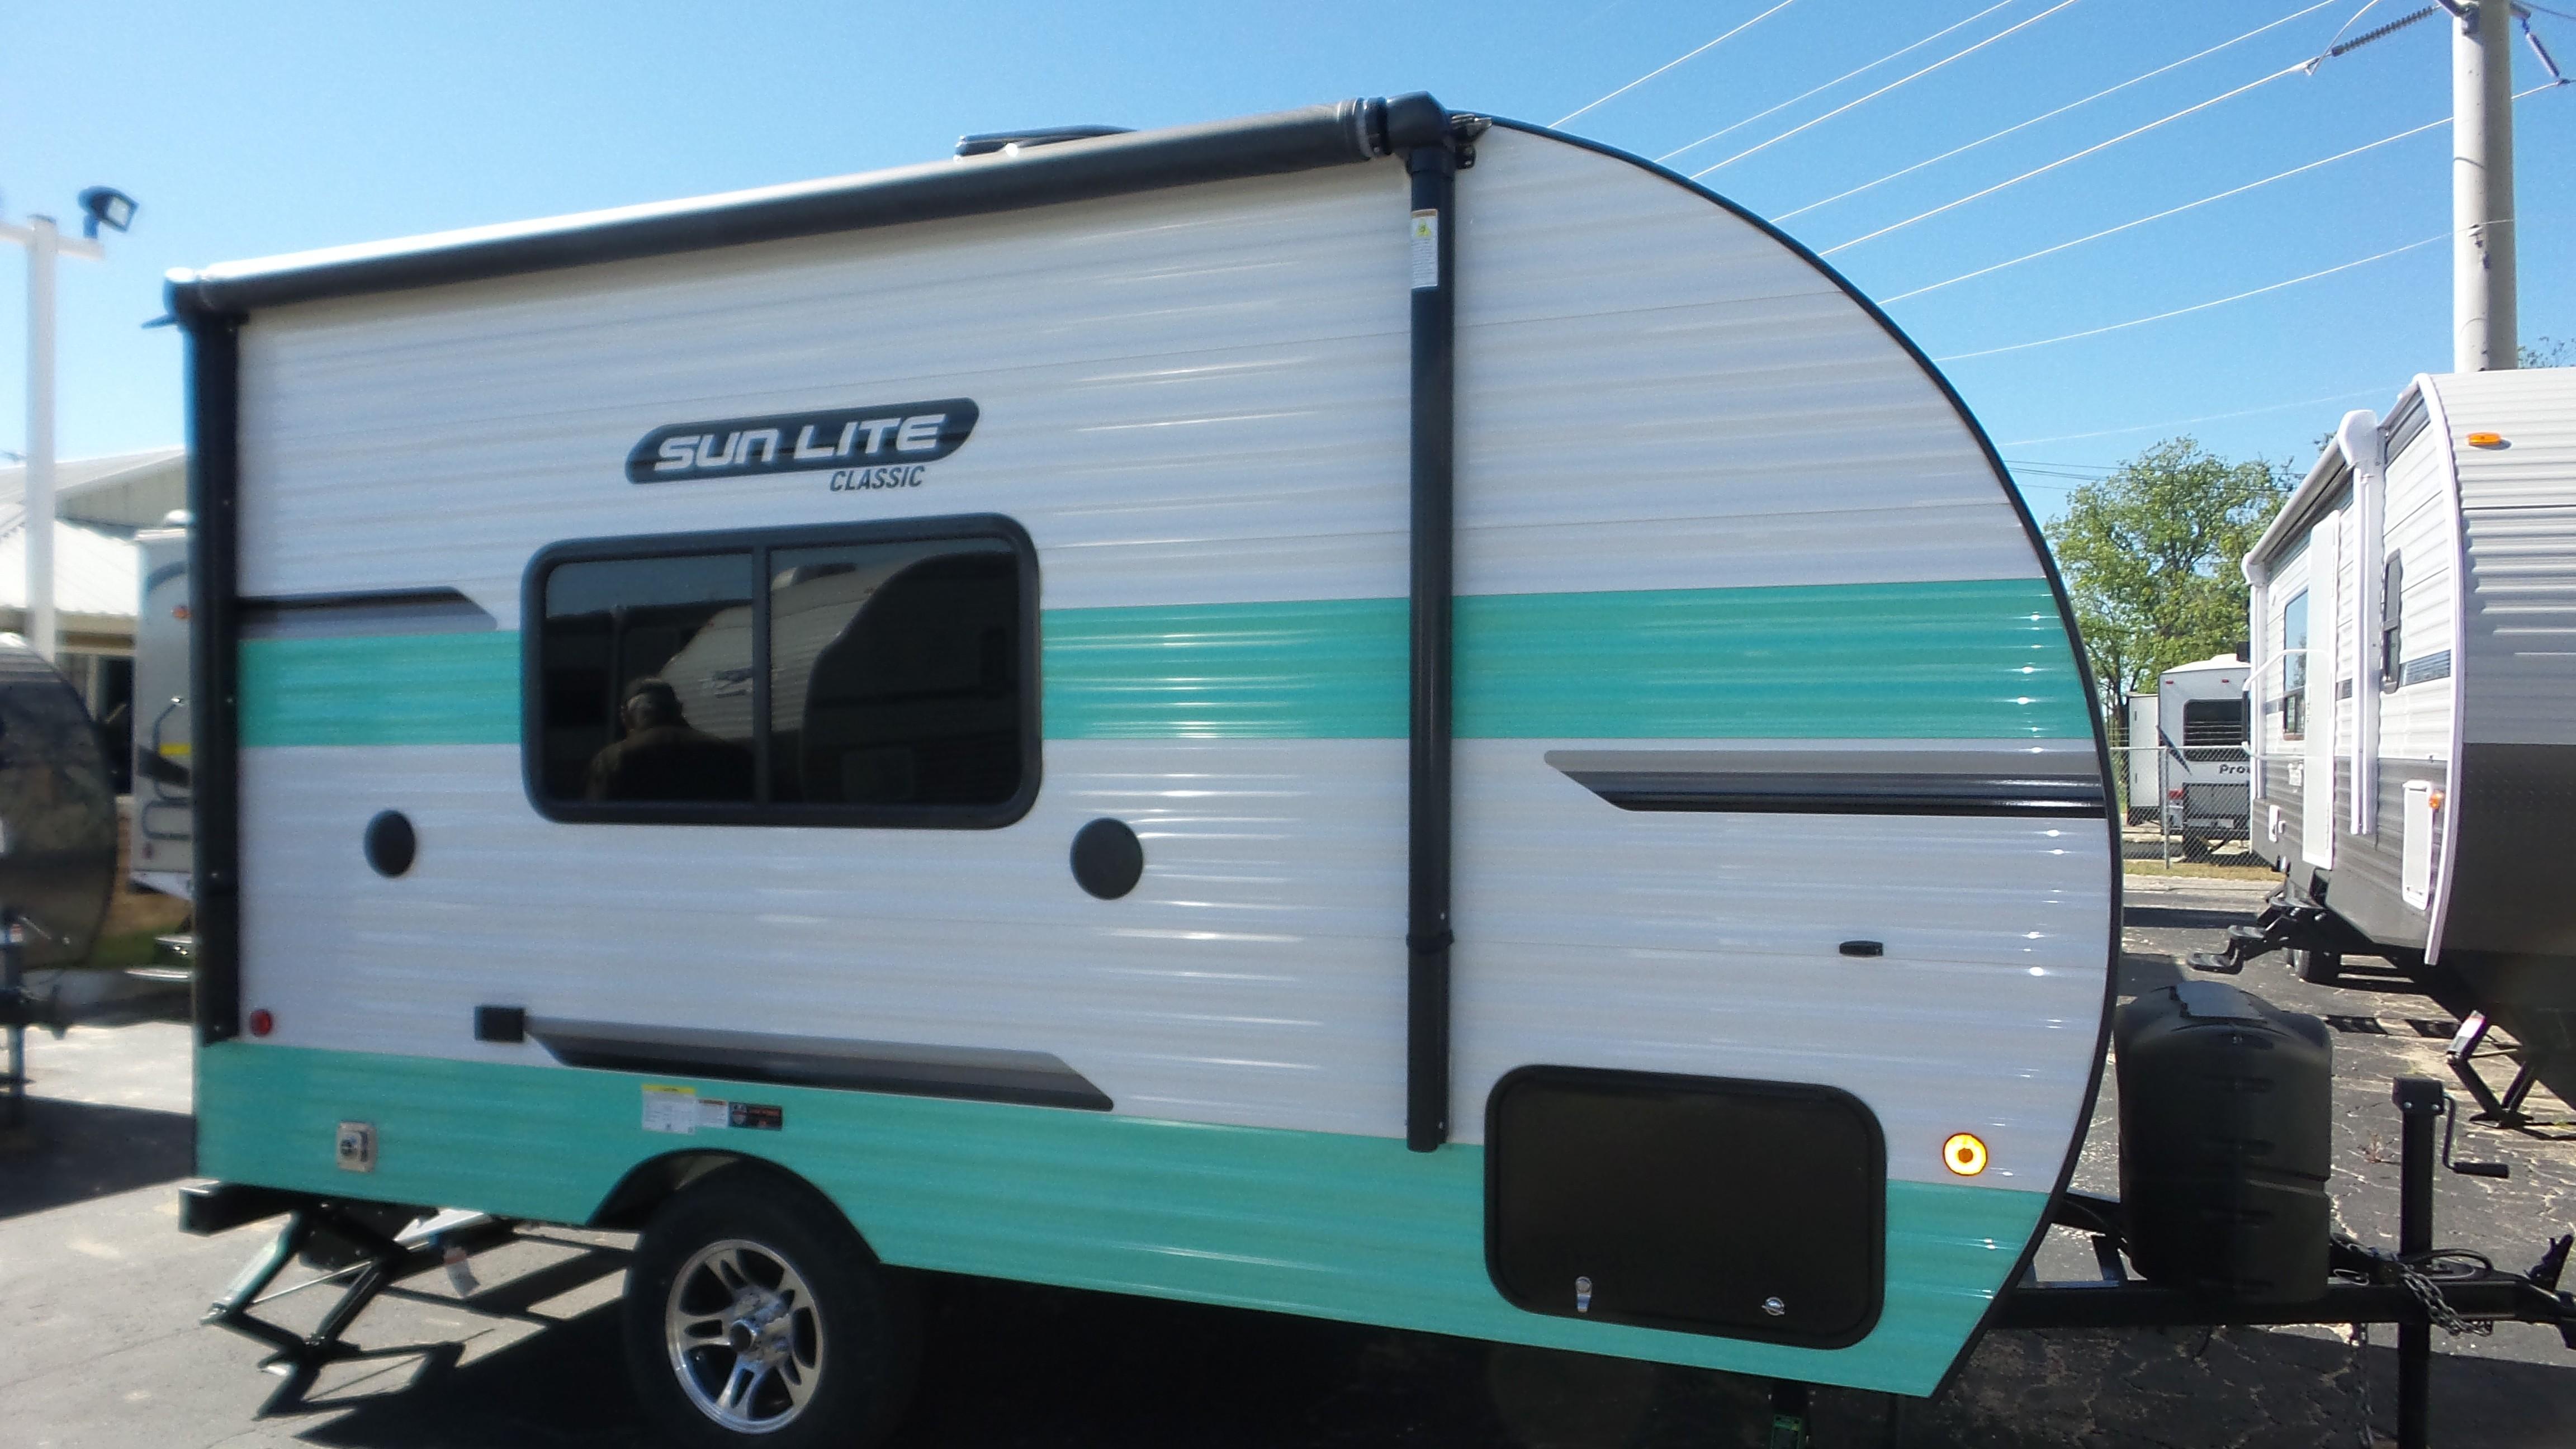 New 2020 Sunset Park RV Sun Lite Classic 16BH in Brownwood, TX